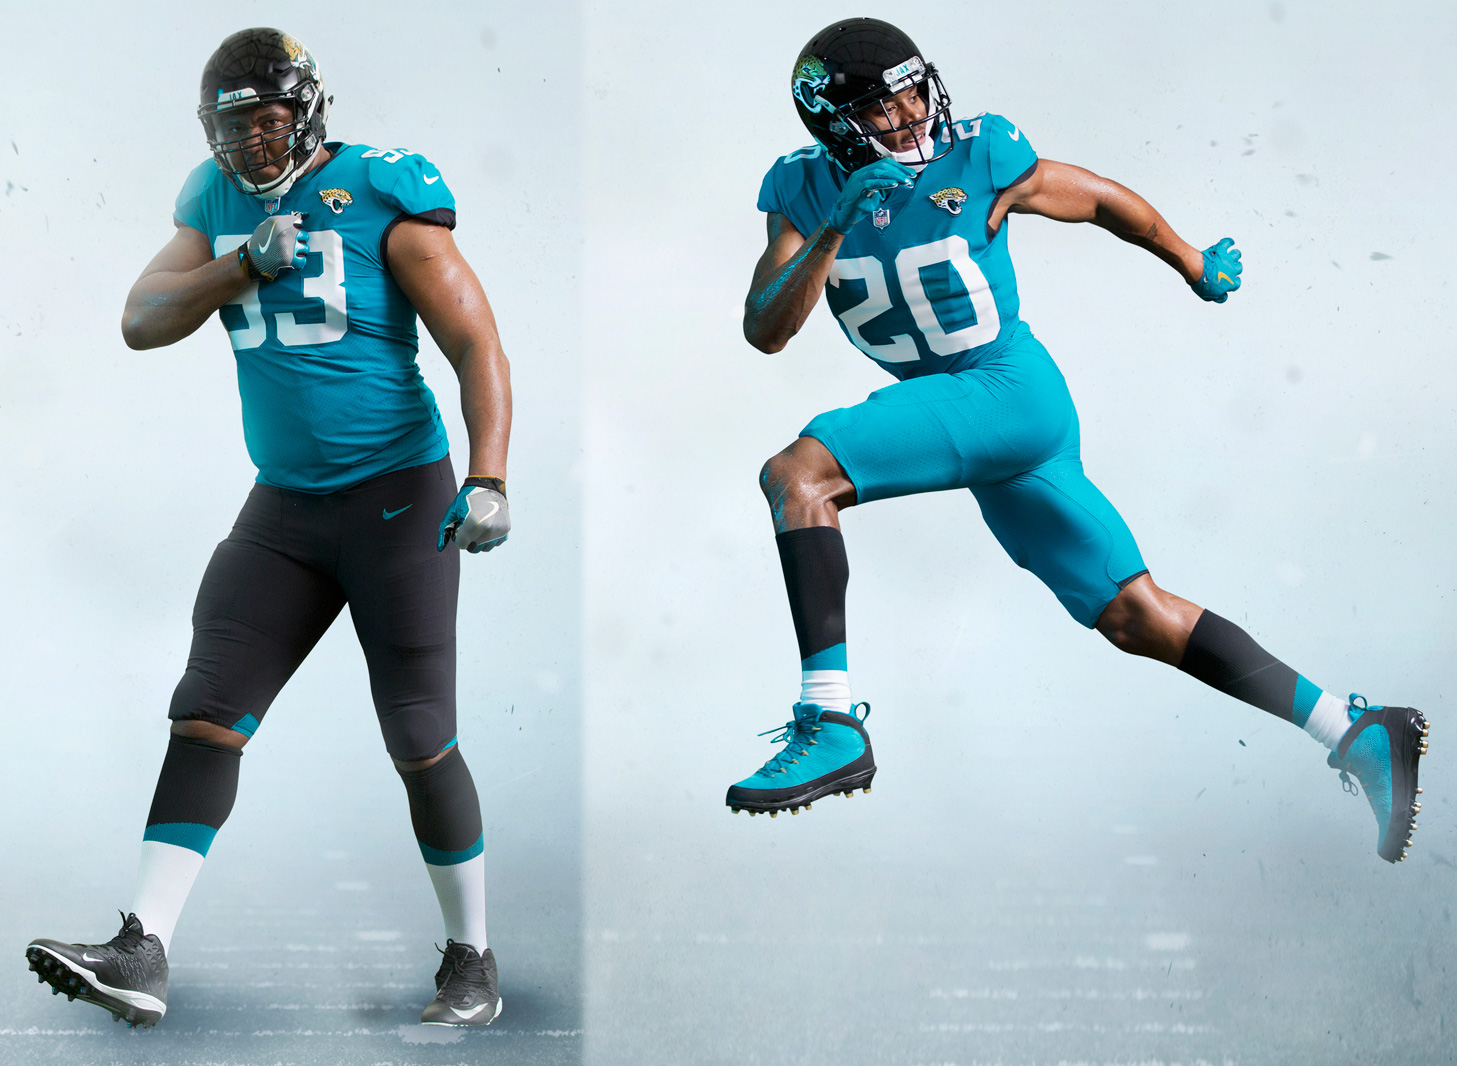 Jaguars-New-Alternate-Teal-Uniform-2018.